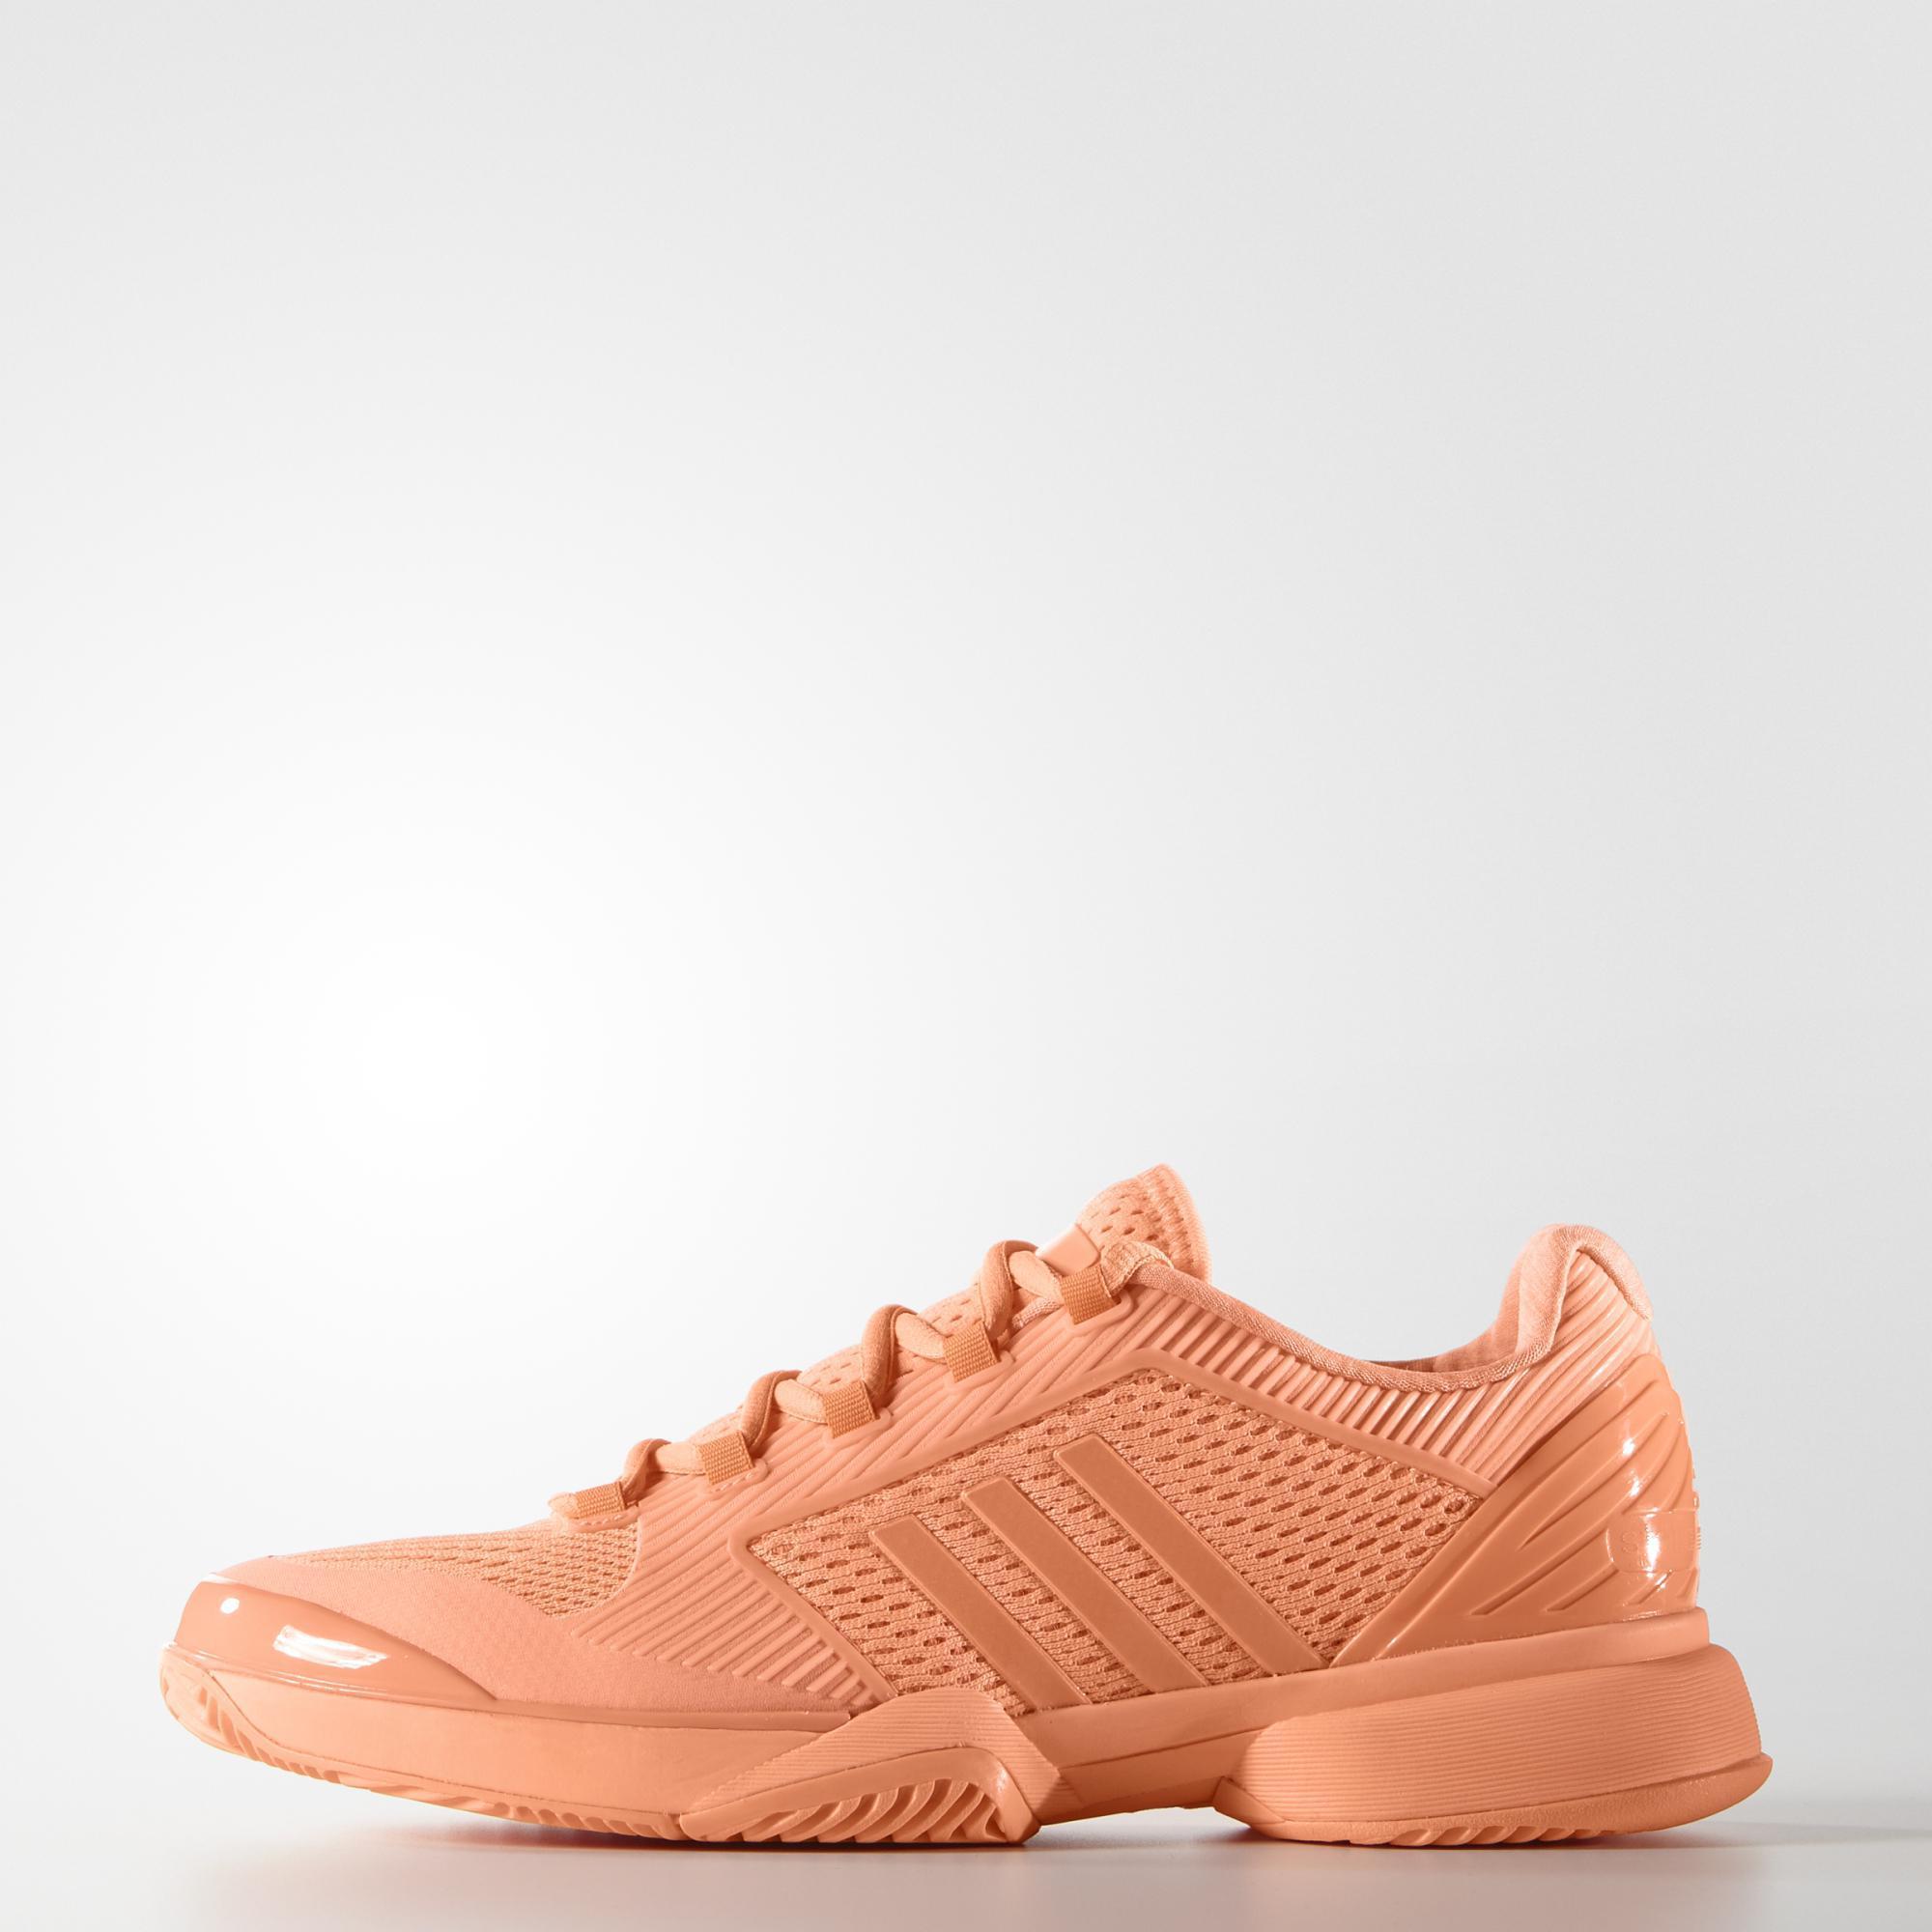 adidas womens barricade 2016 tennis shoes